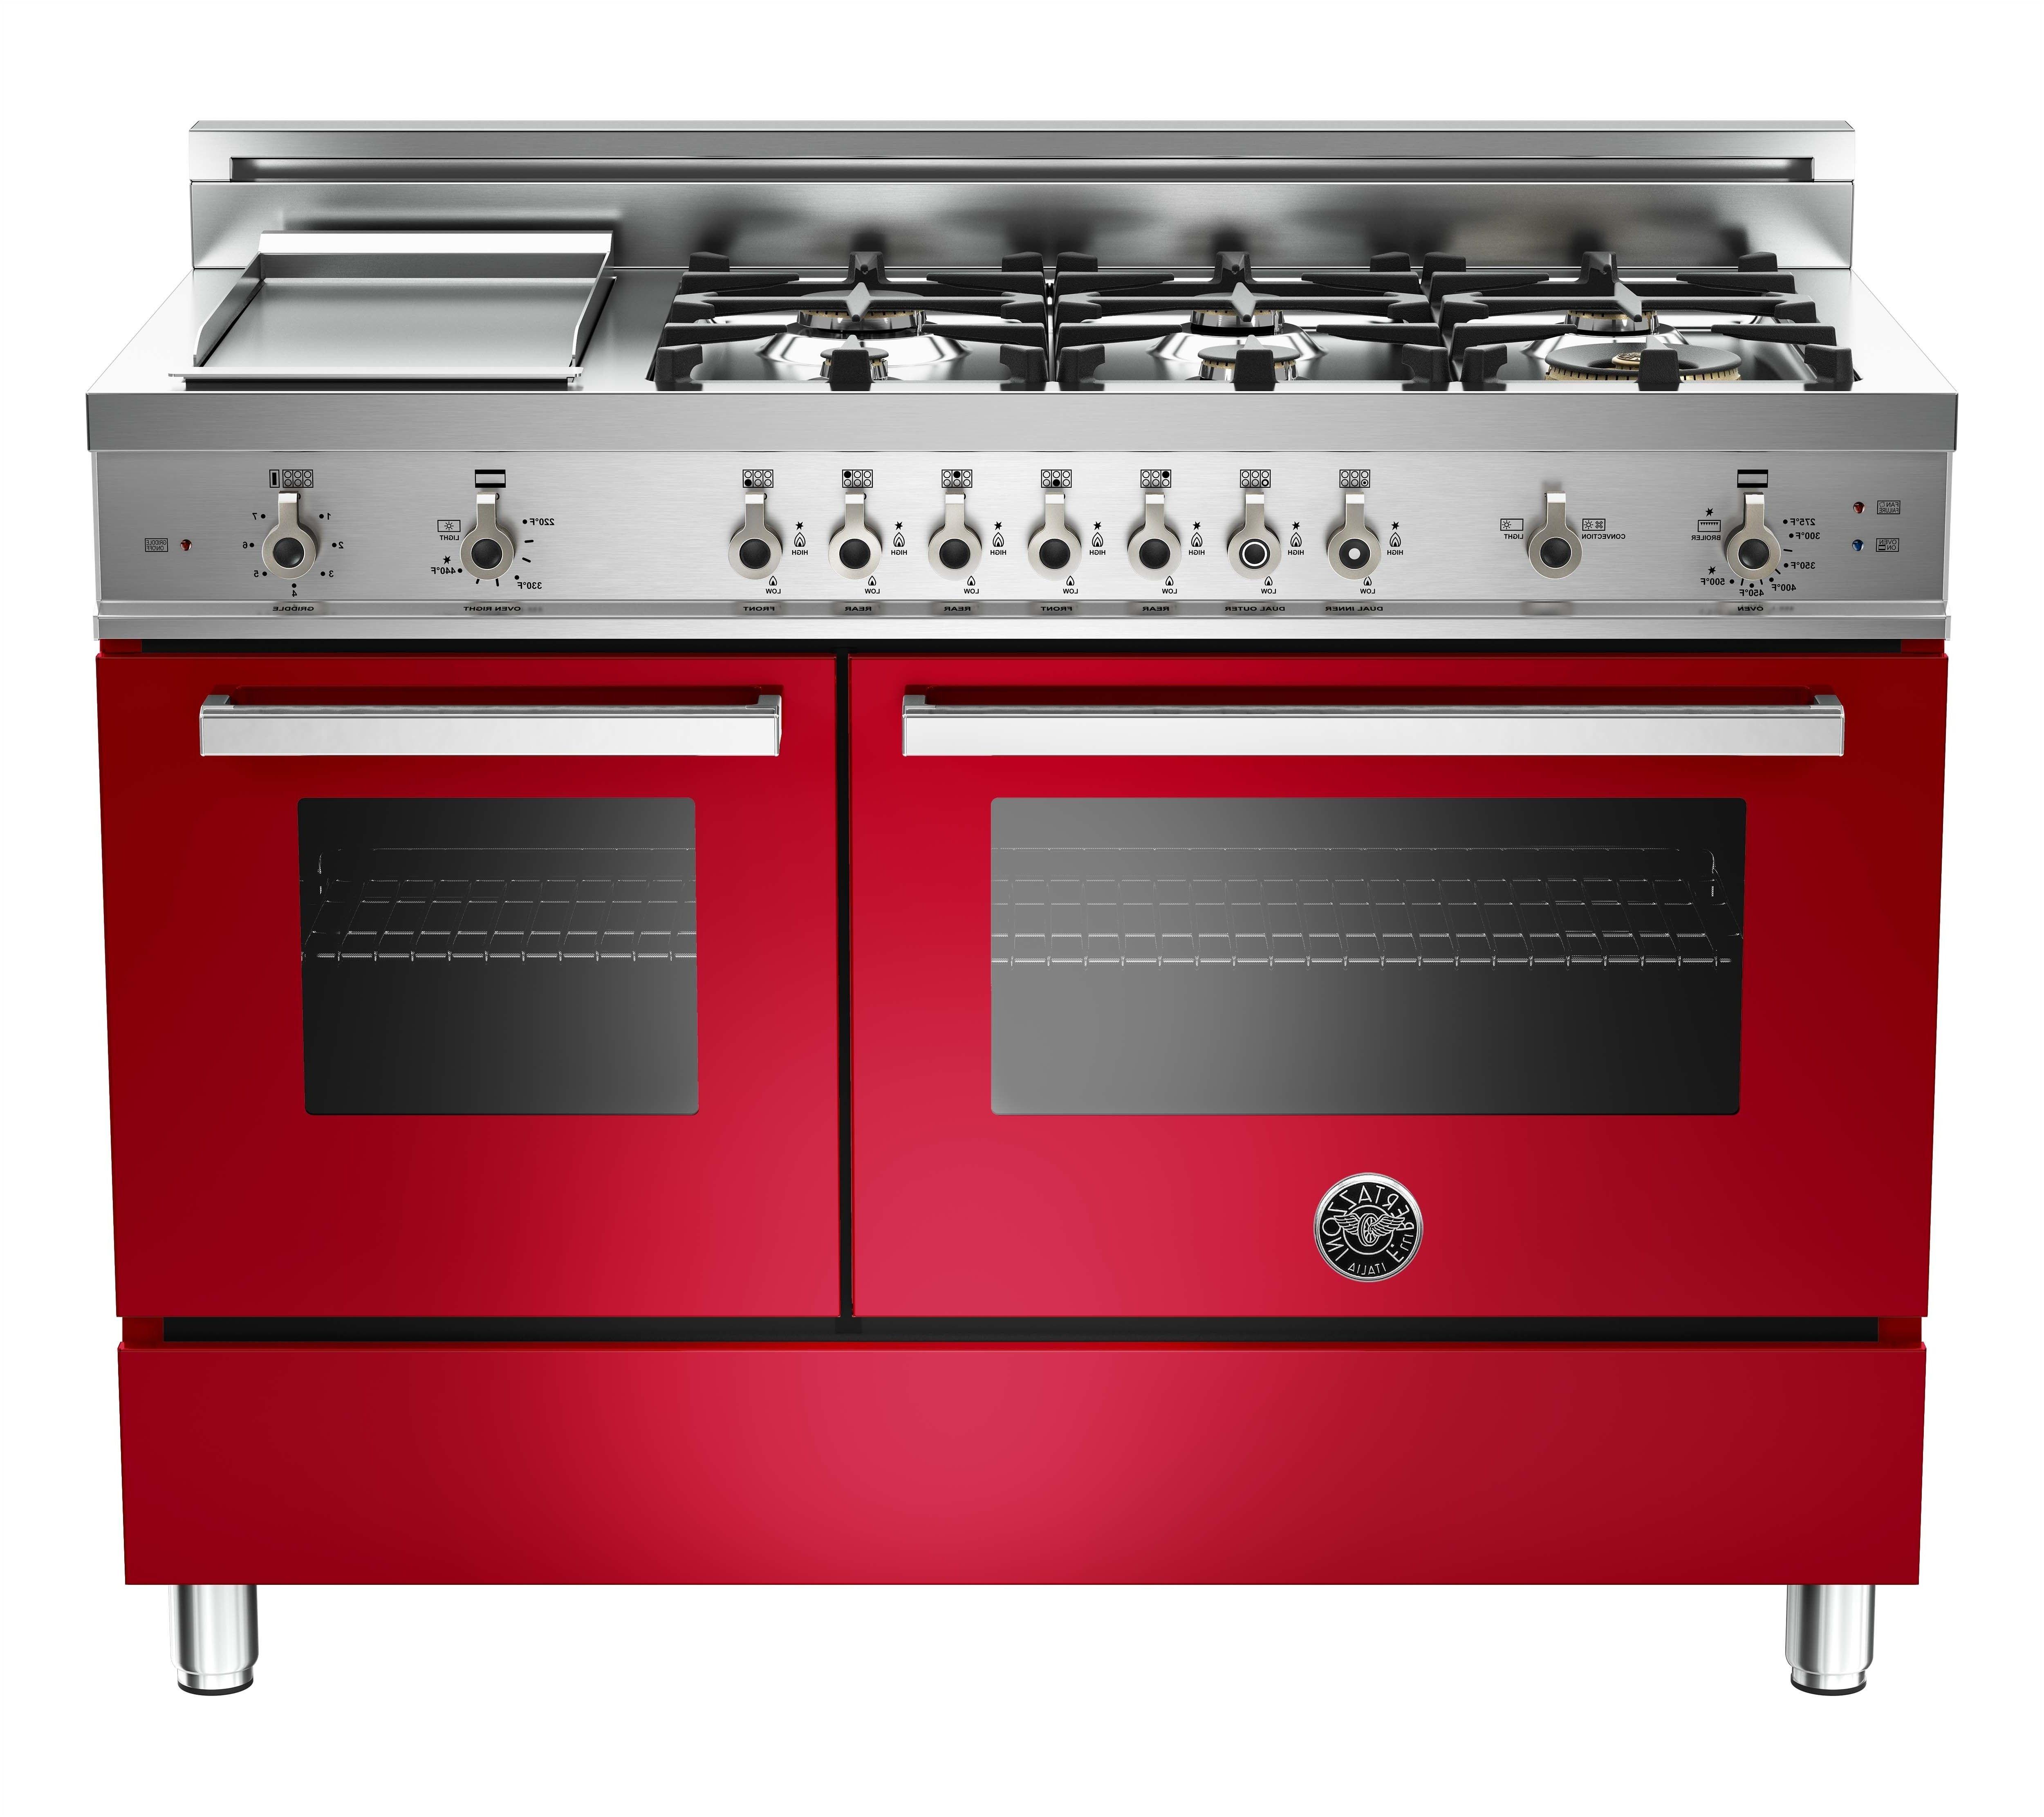 best luxury appliance brands photos architectural digest from Best ...